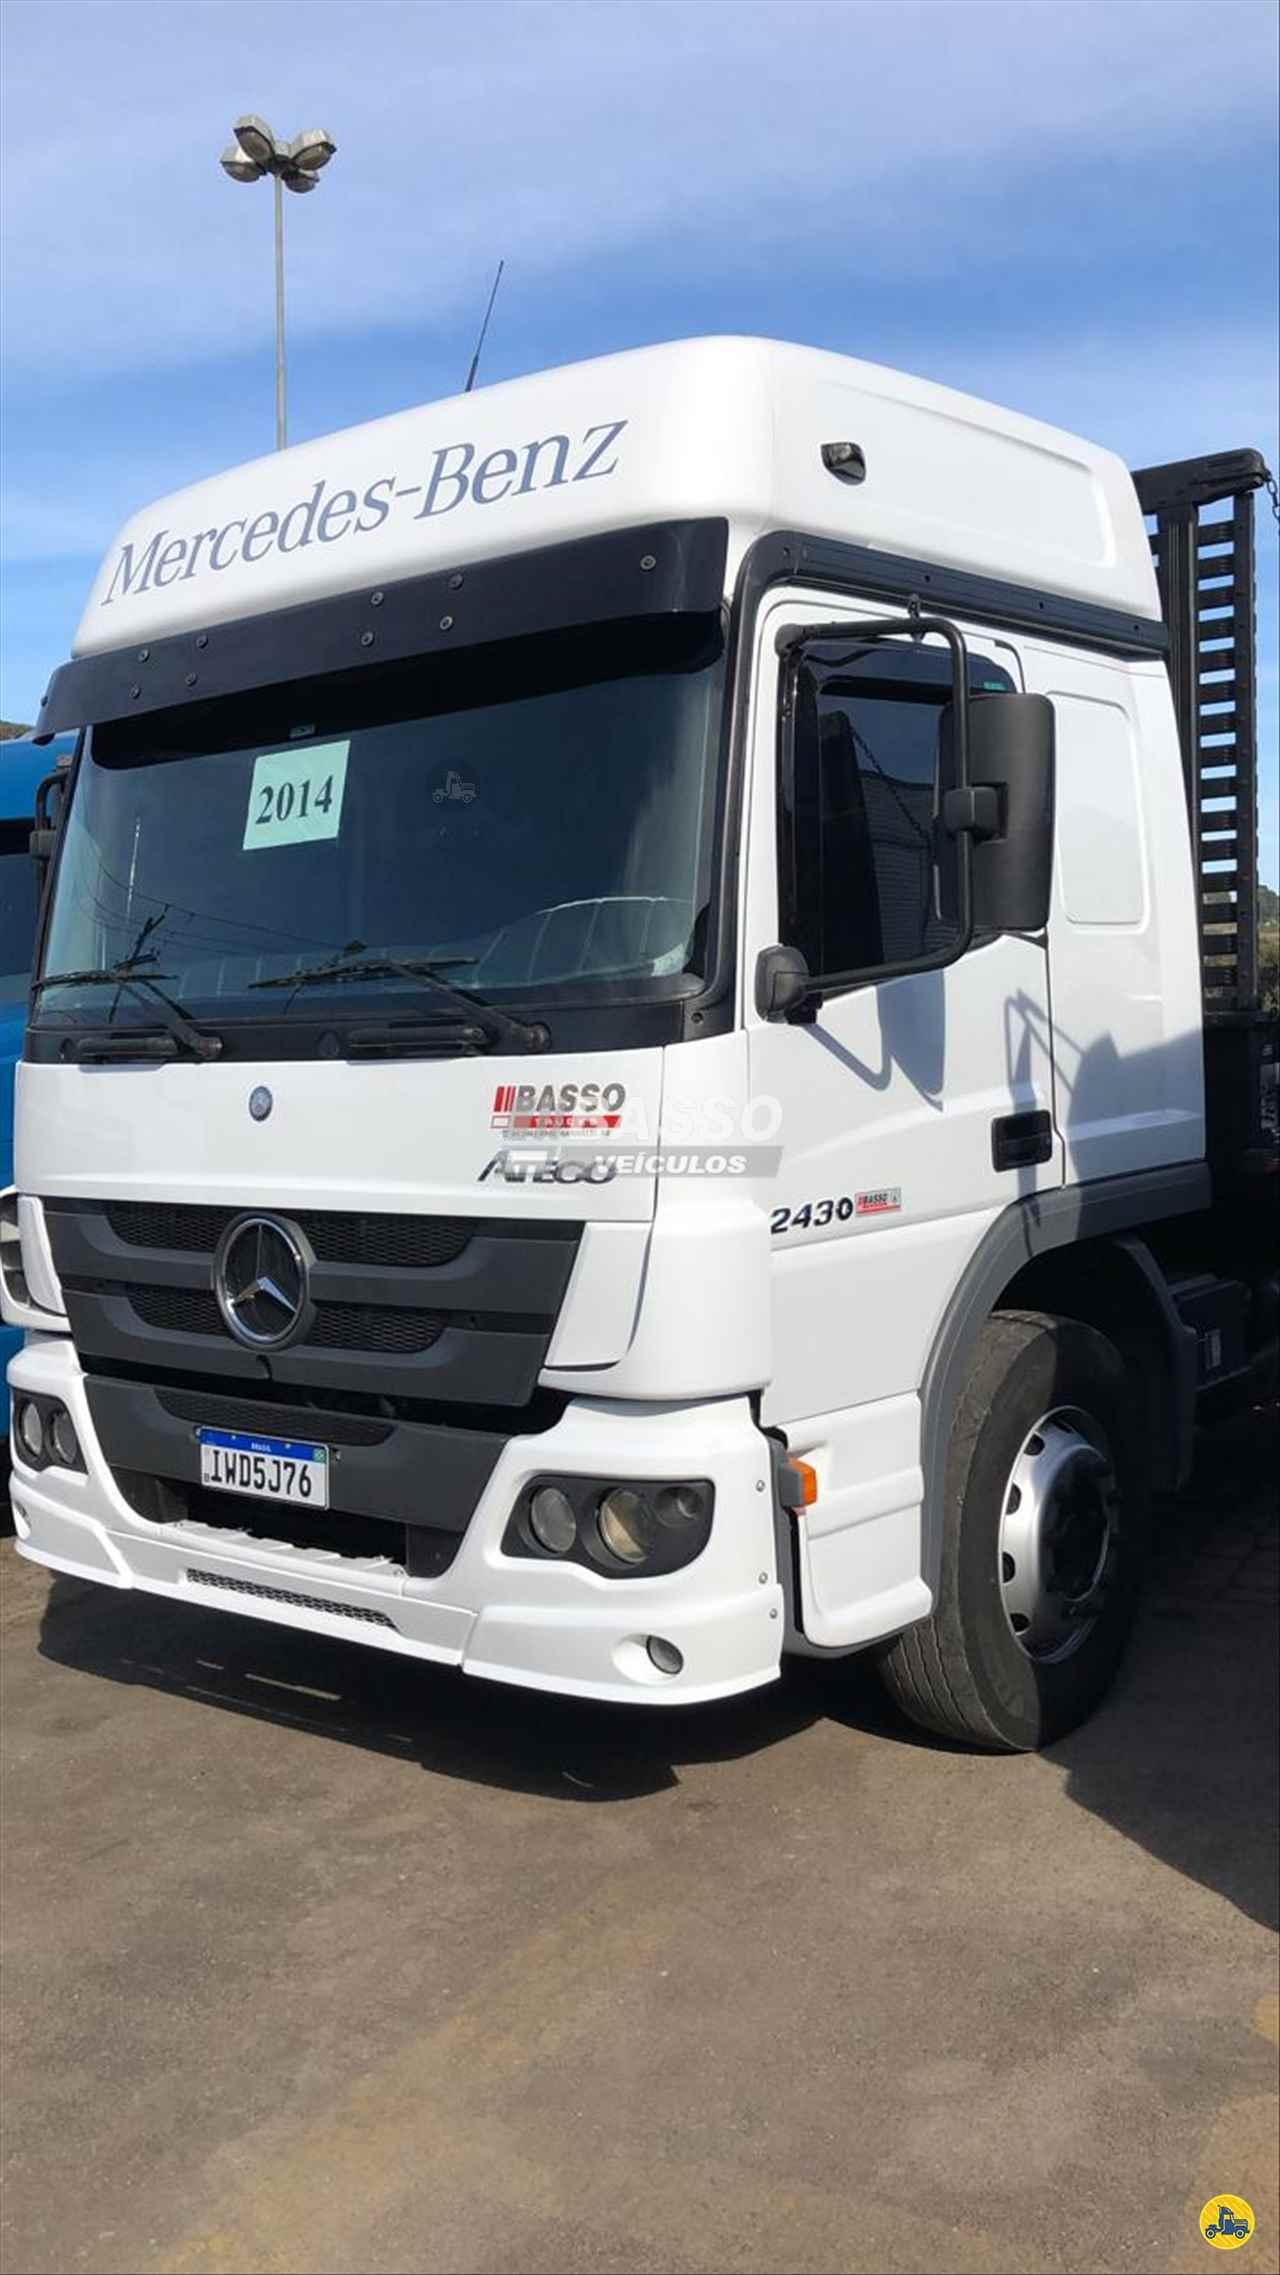 CAMINHAO MERCEDES-BENZ MB 2430 Carga Seca Truck 6x2 Basso Veículos GARIBALDI RIO GRANDE DO SUL RS